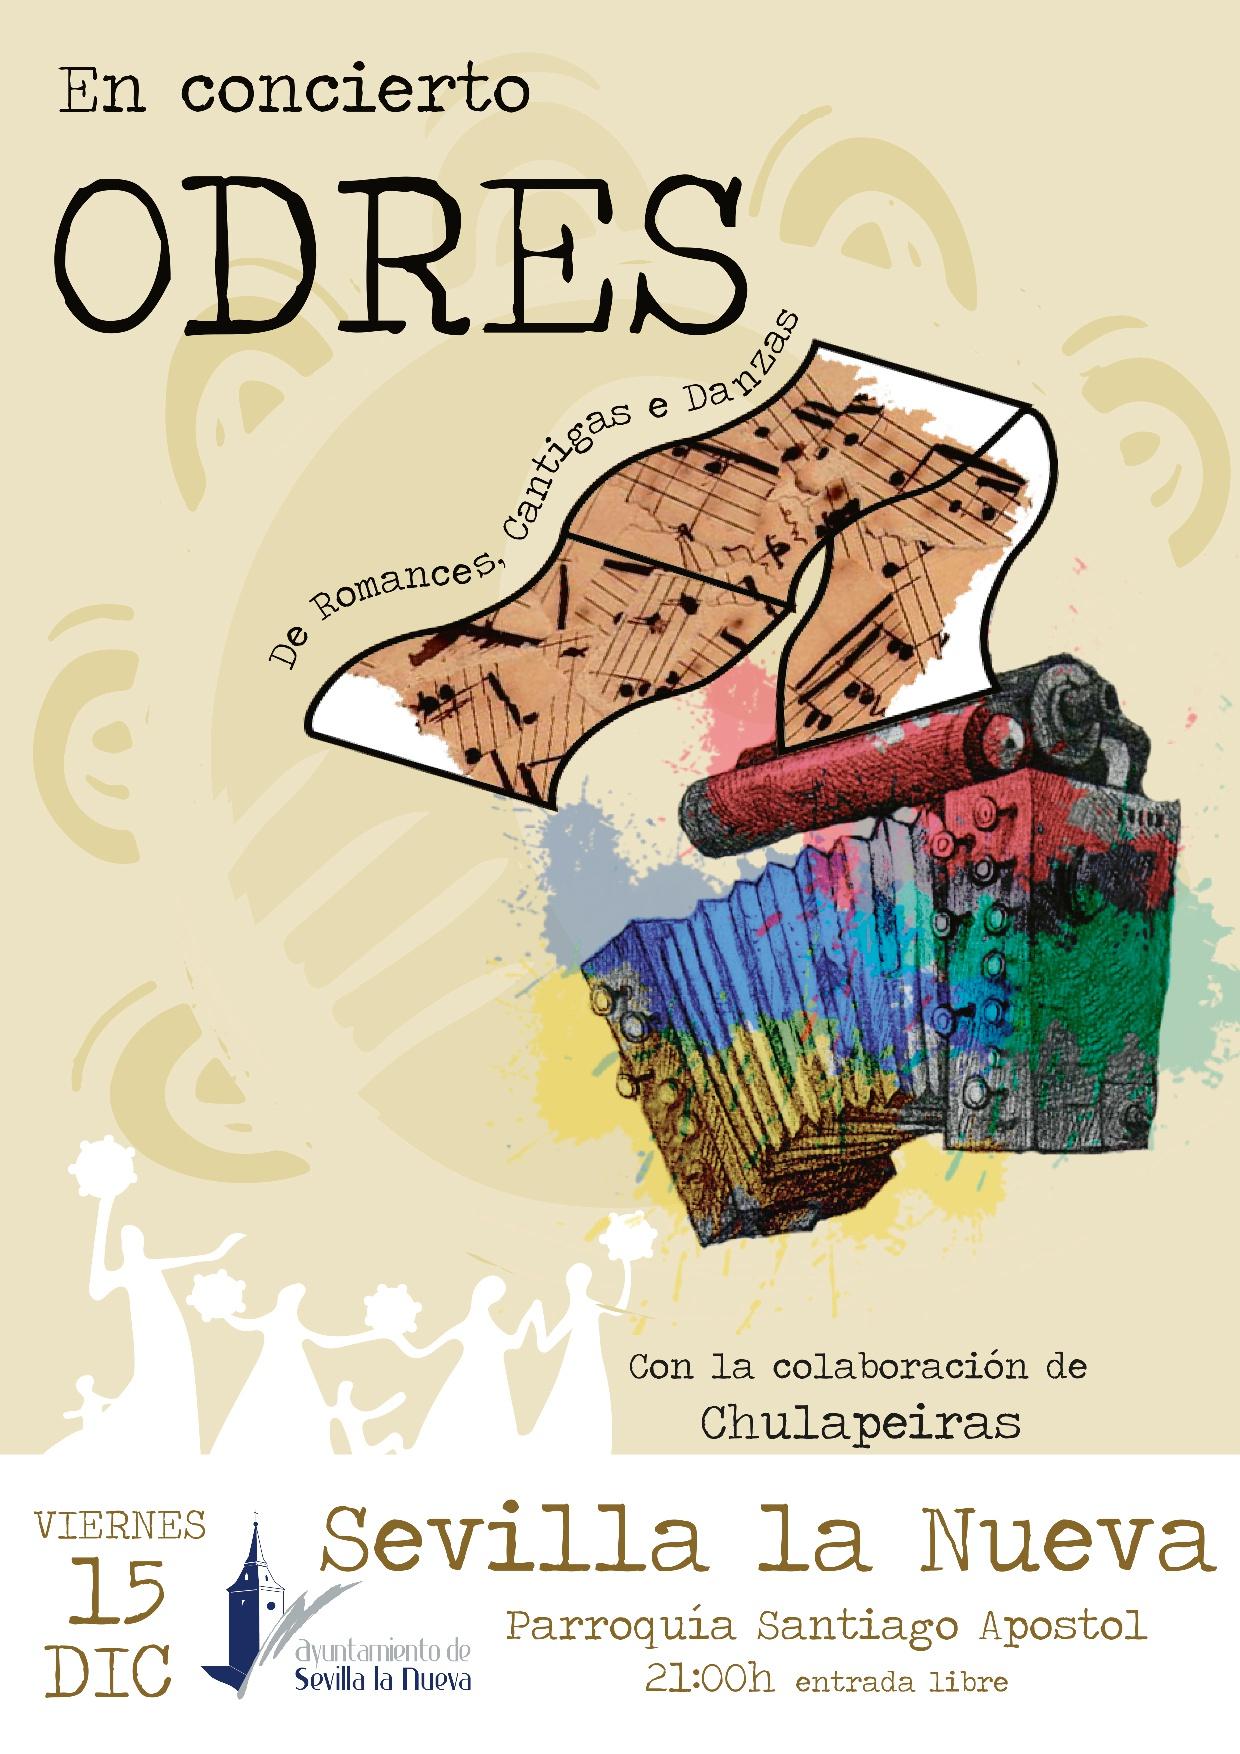 Concierto - Grupo 'Odres' @ Parroquia Santiago Apóstol